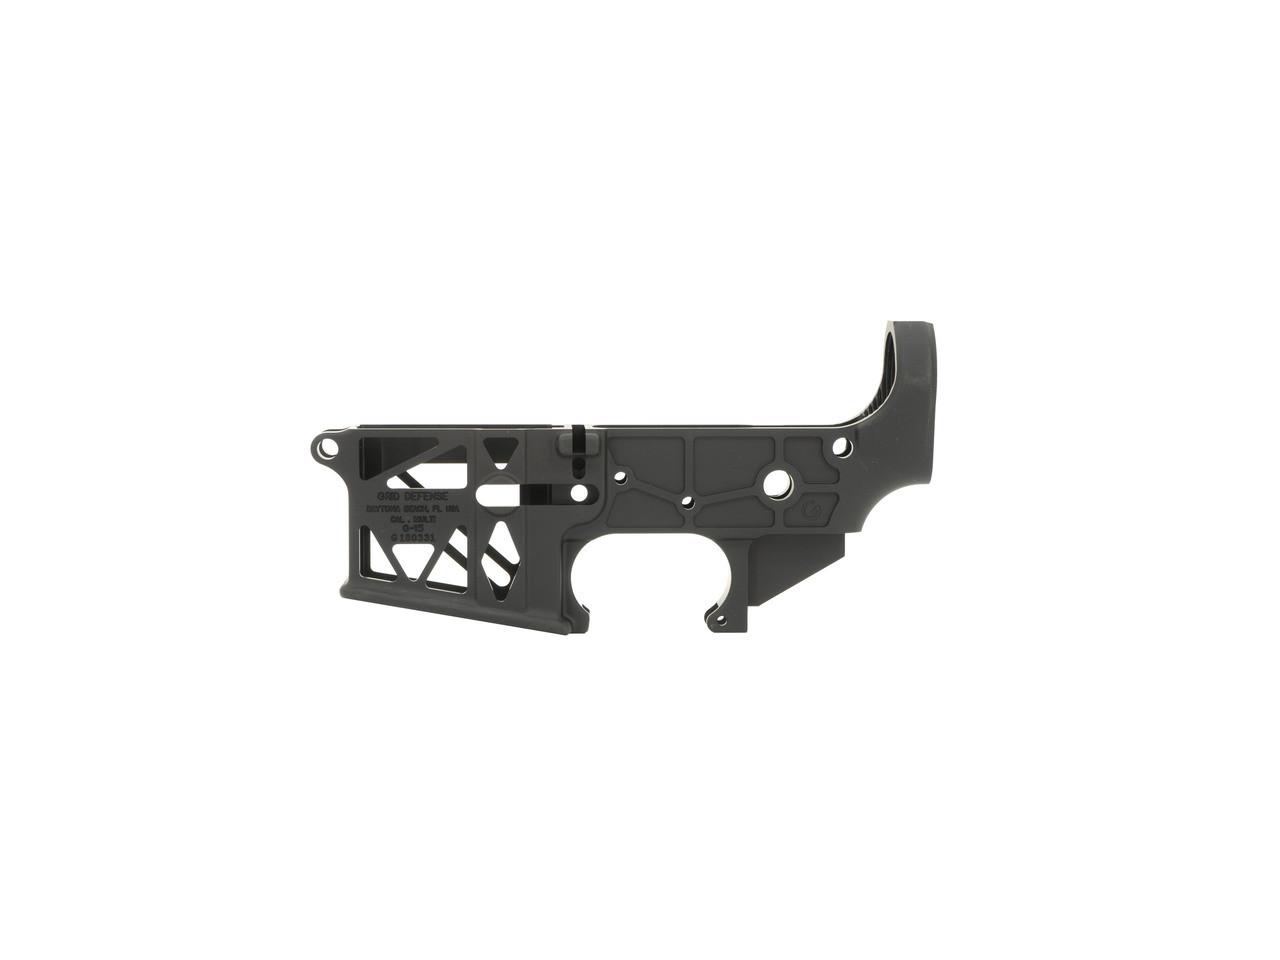 Grid Defense AR15 Stripped Skeletonized Lower Receiver - Black Anodized